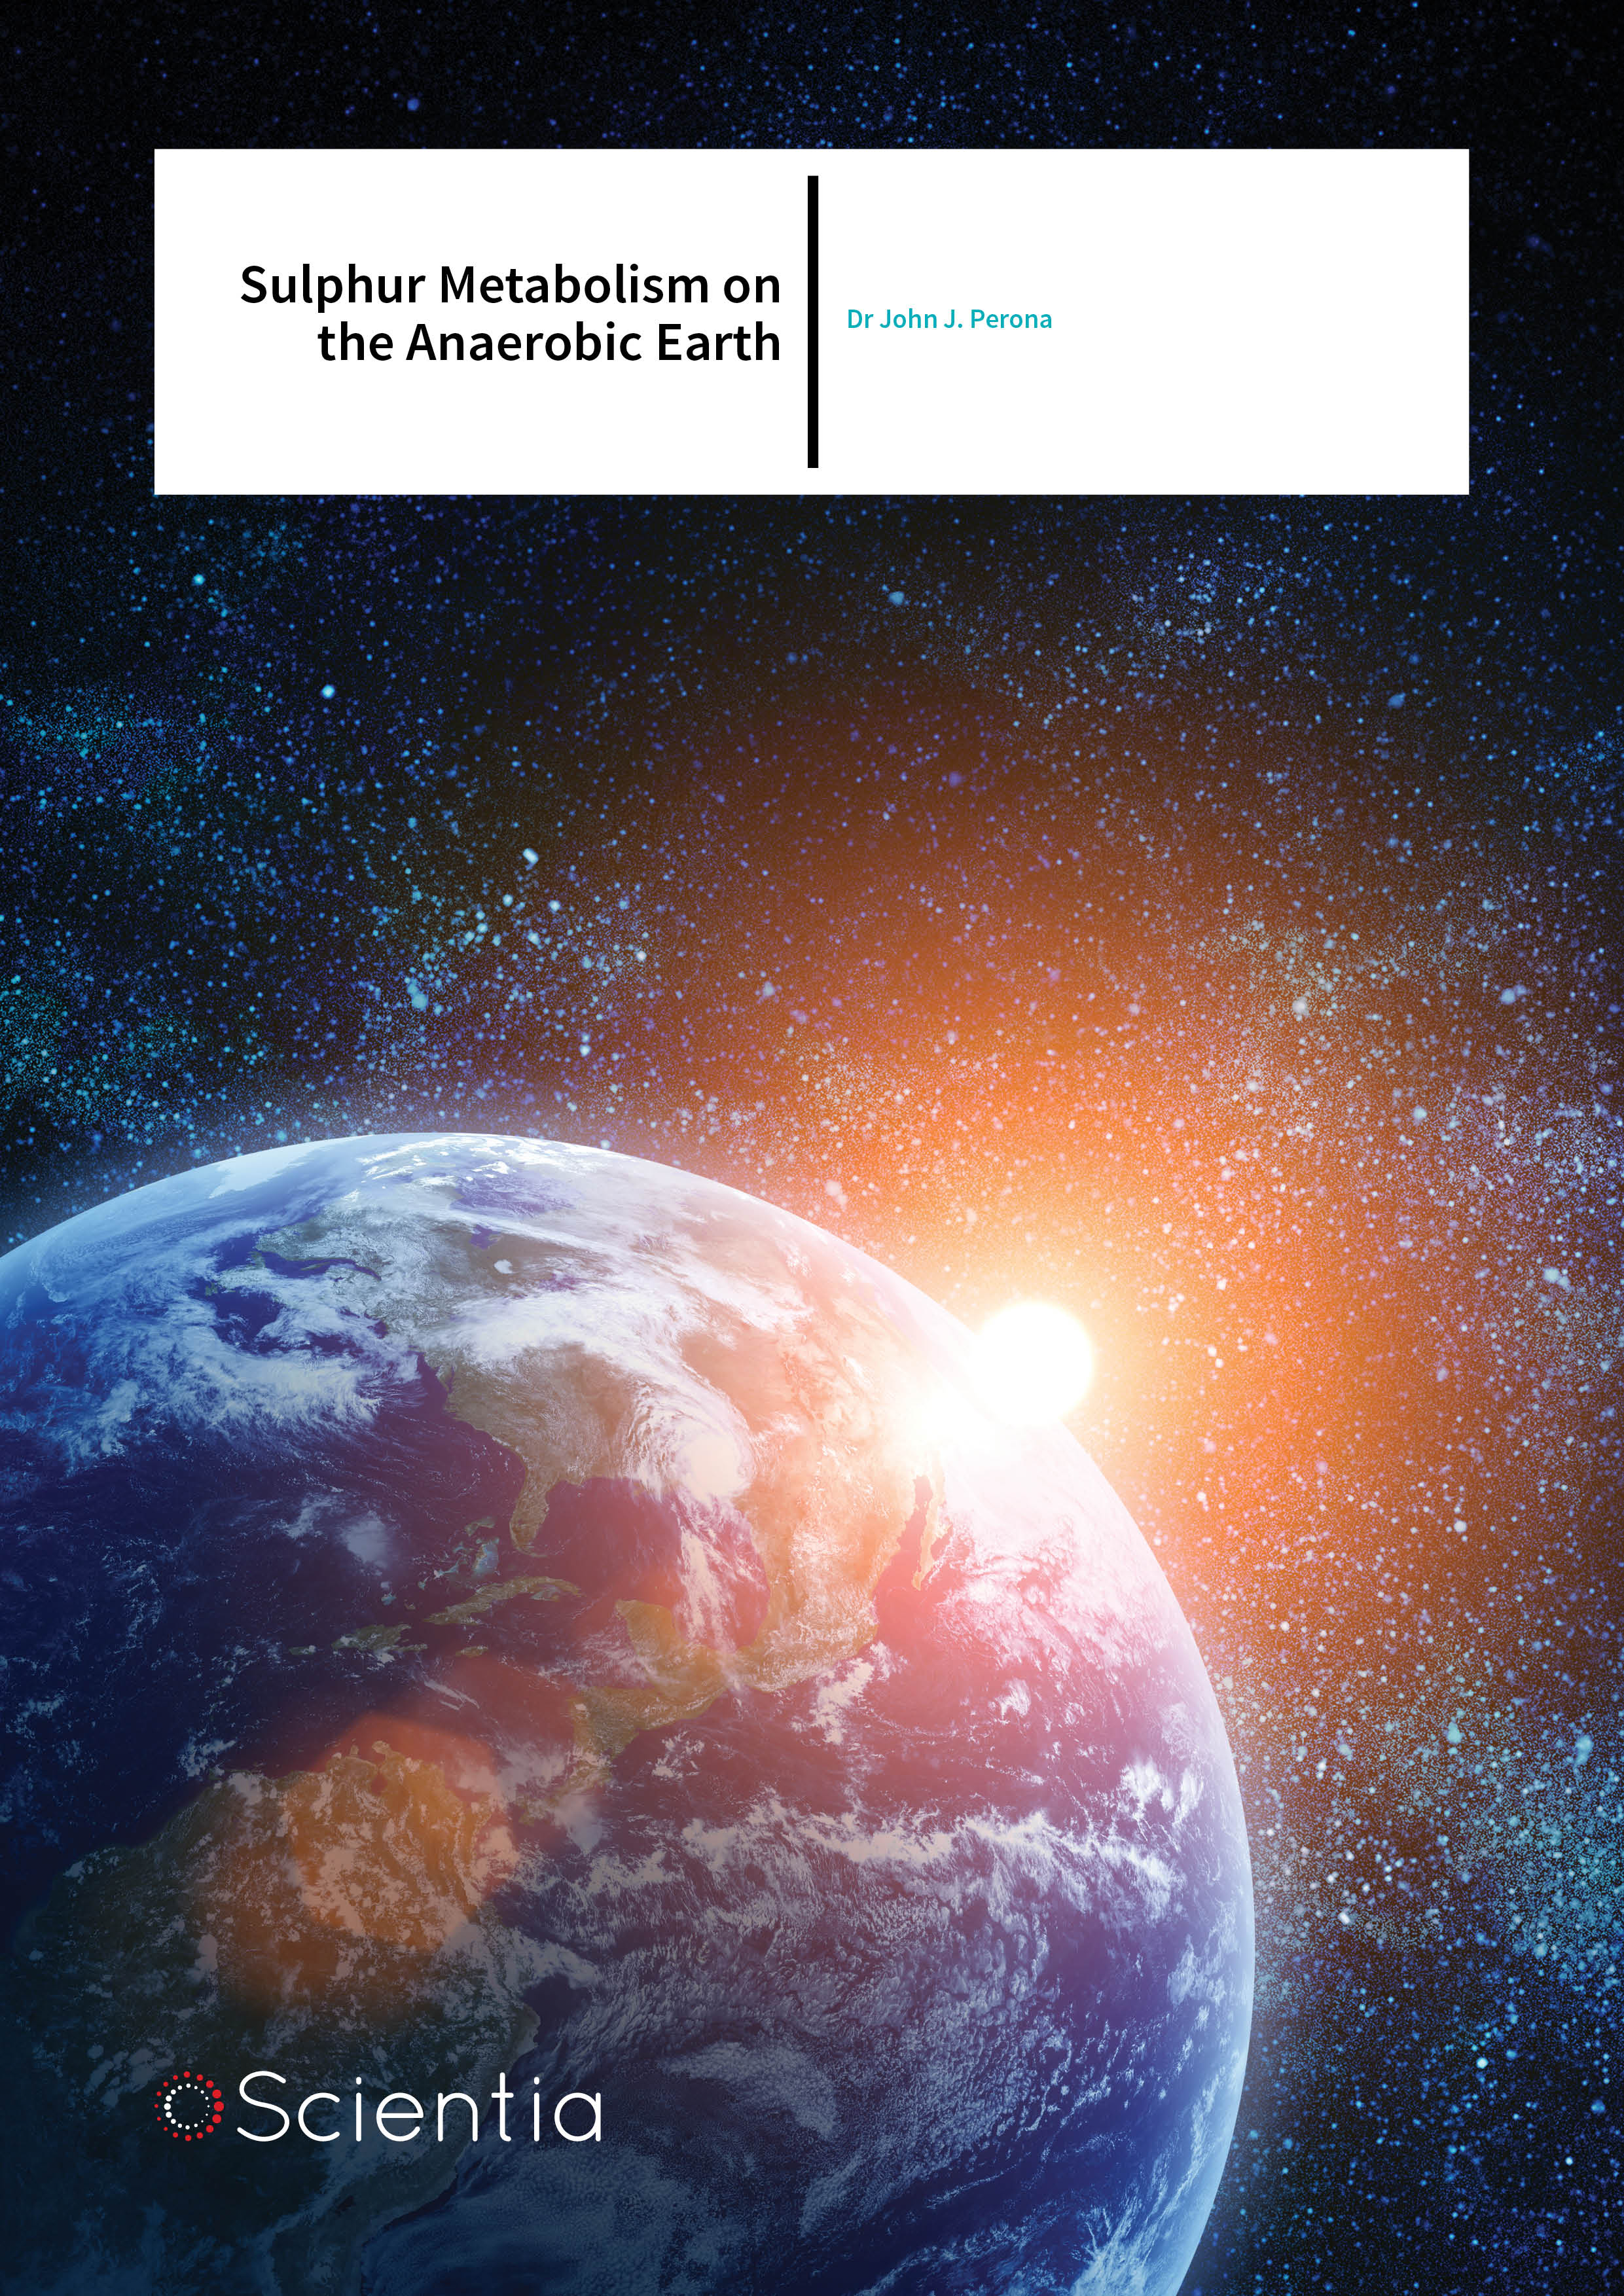 Dr John J. Perona – Sulphur Metabolism On The Anaerobic Earth